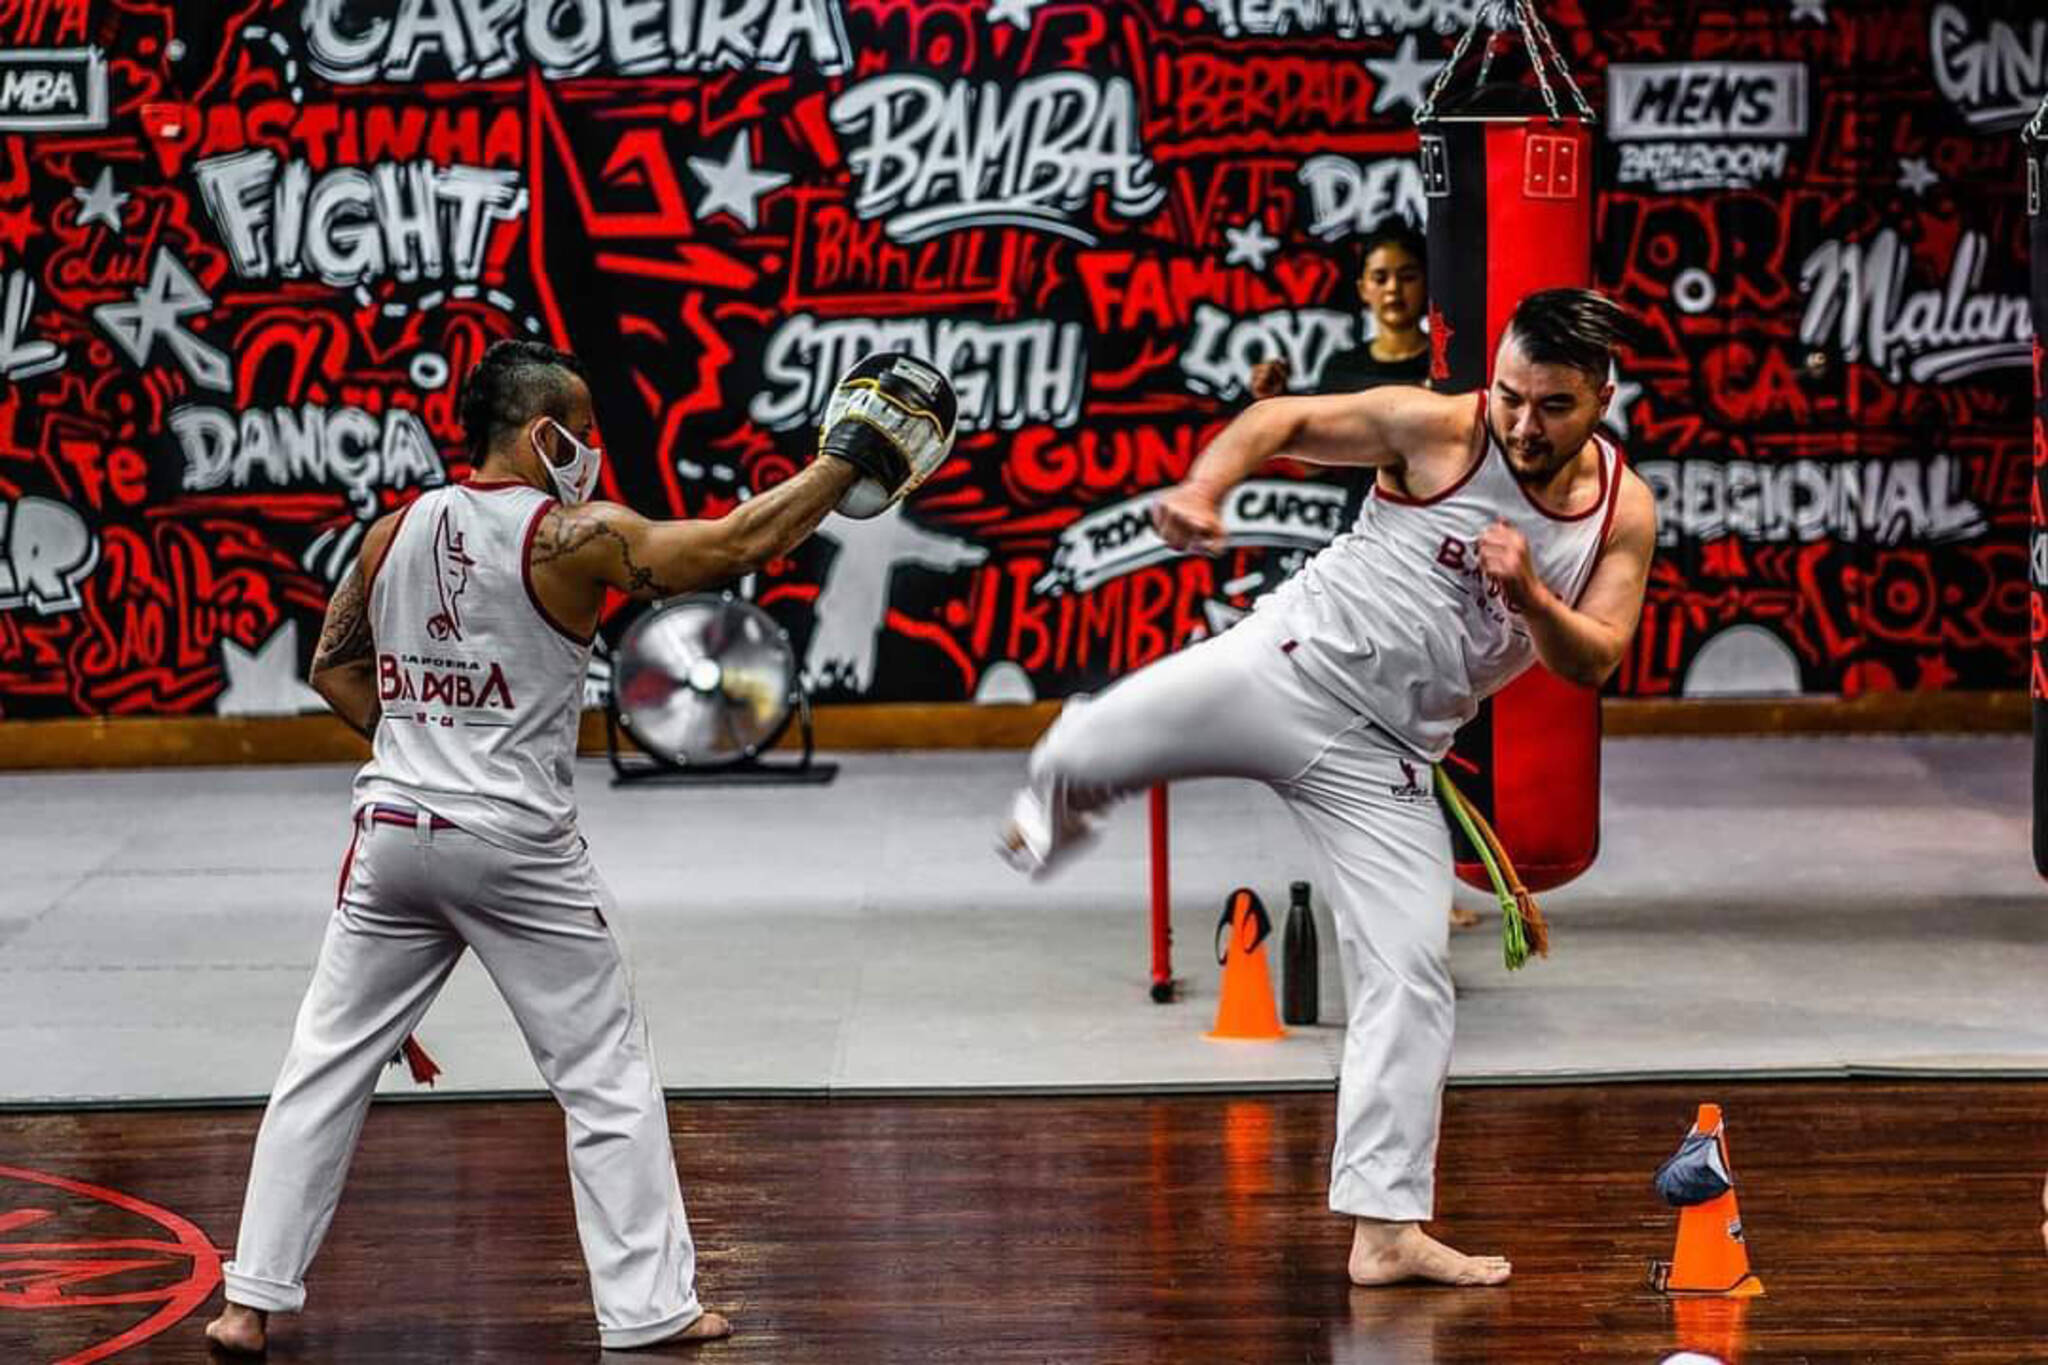 Capoeira Bamba